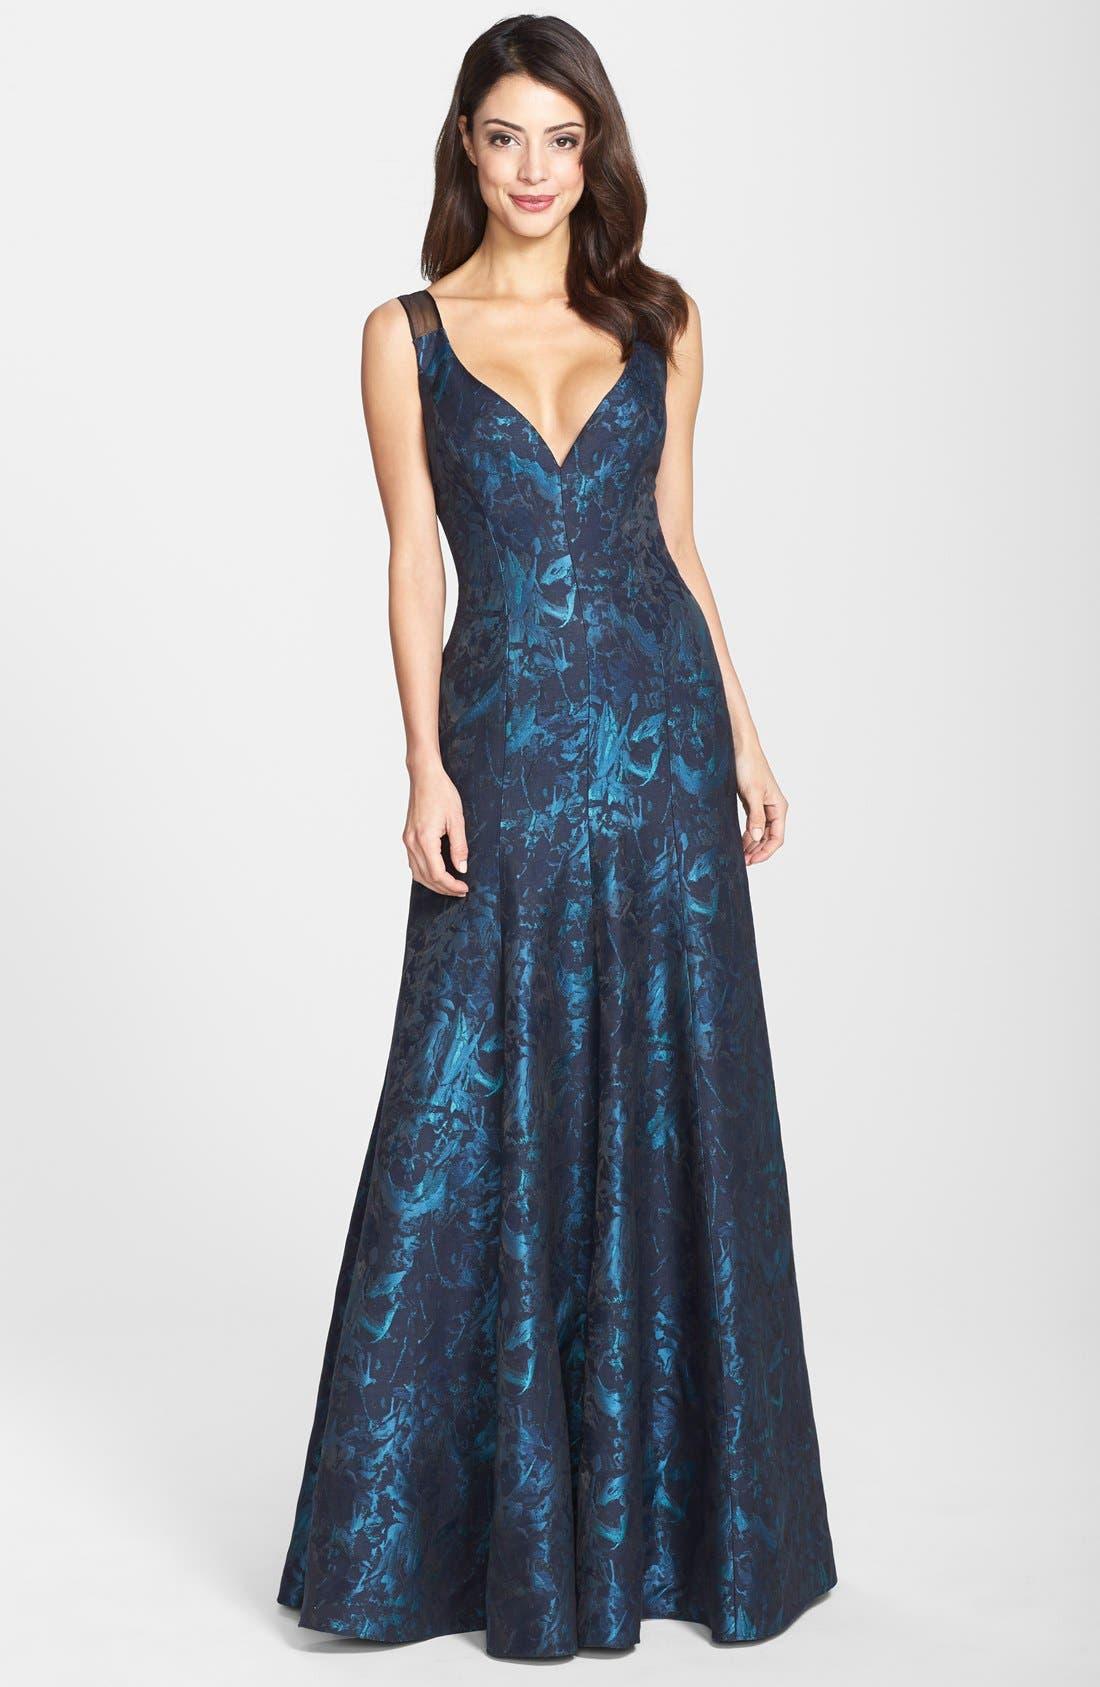 Alternate Image 1 Selected - Vera Wang Sleeveless Plunge Cut V-Neck Silk Jacquard Gown (Women)